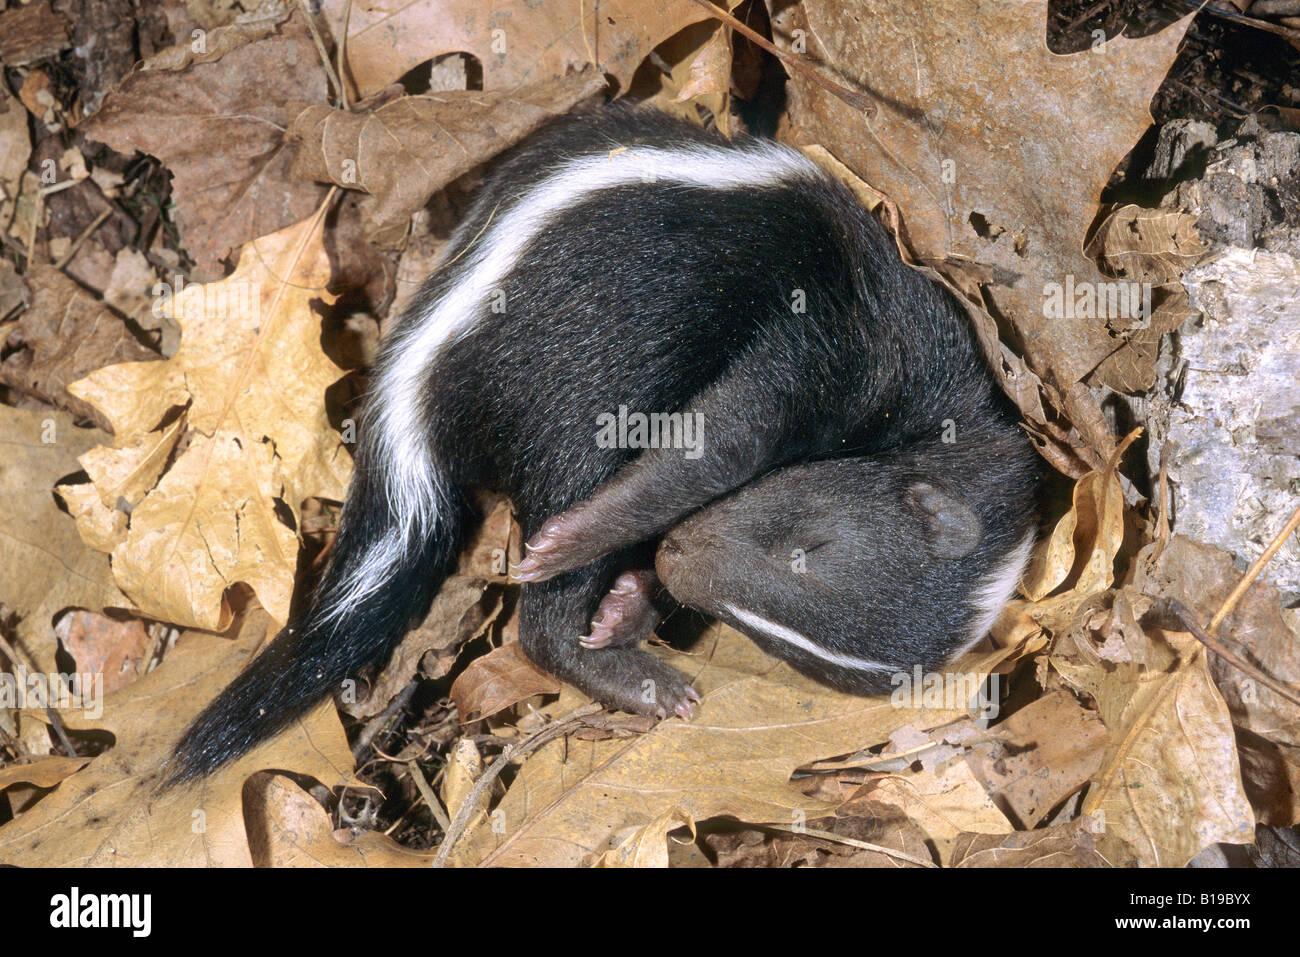 Neonato skunk striato (Mephitis mephitis) snoozing nella famiglia natal den, Minnesota. Immagini Stock